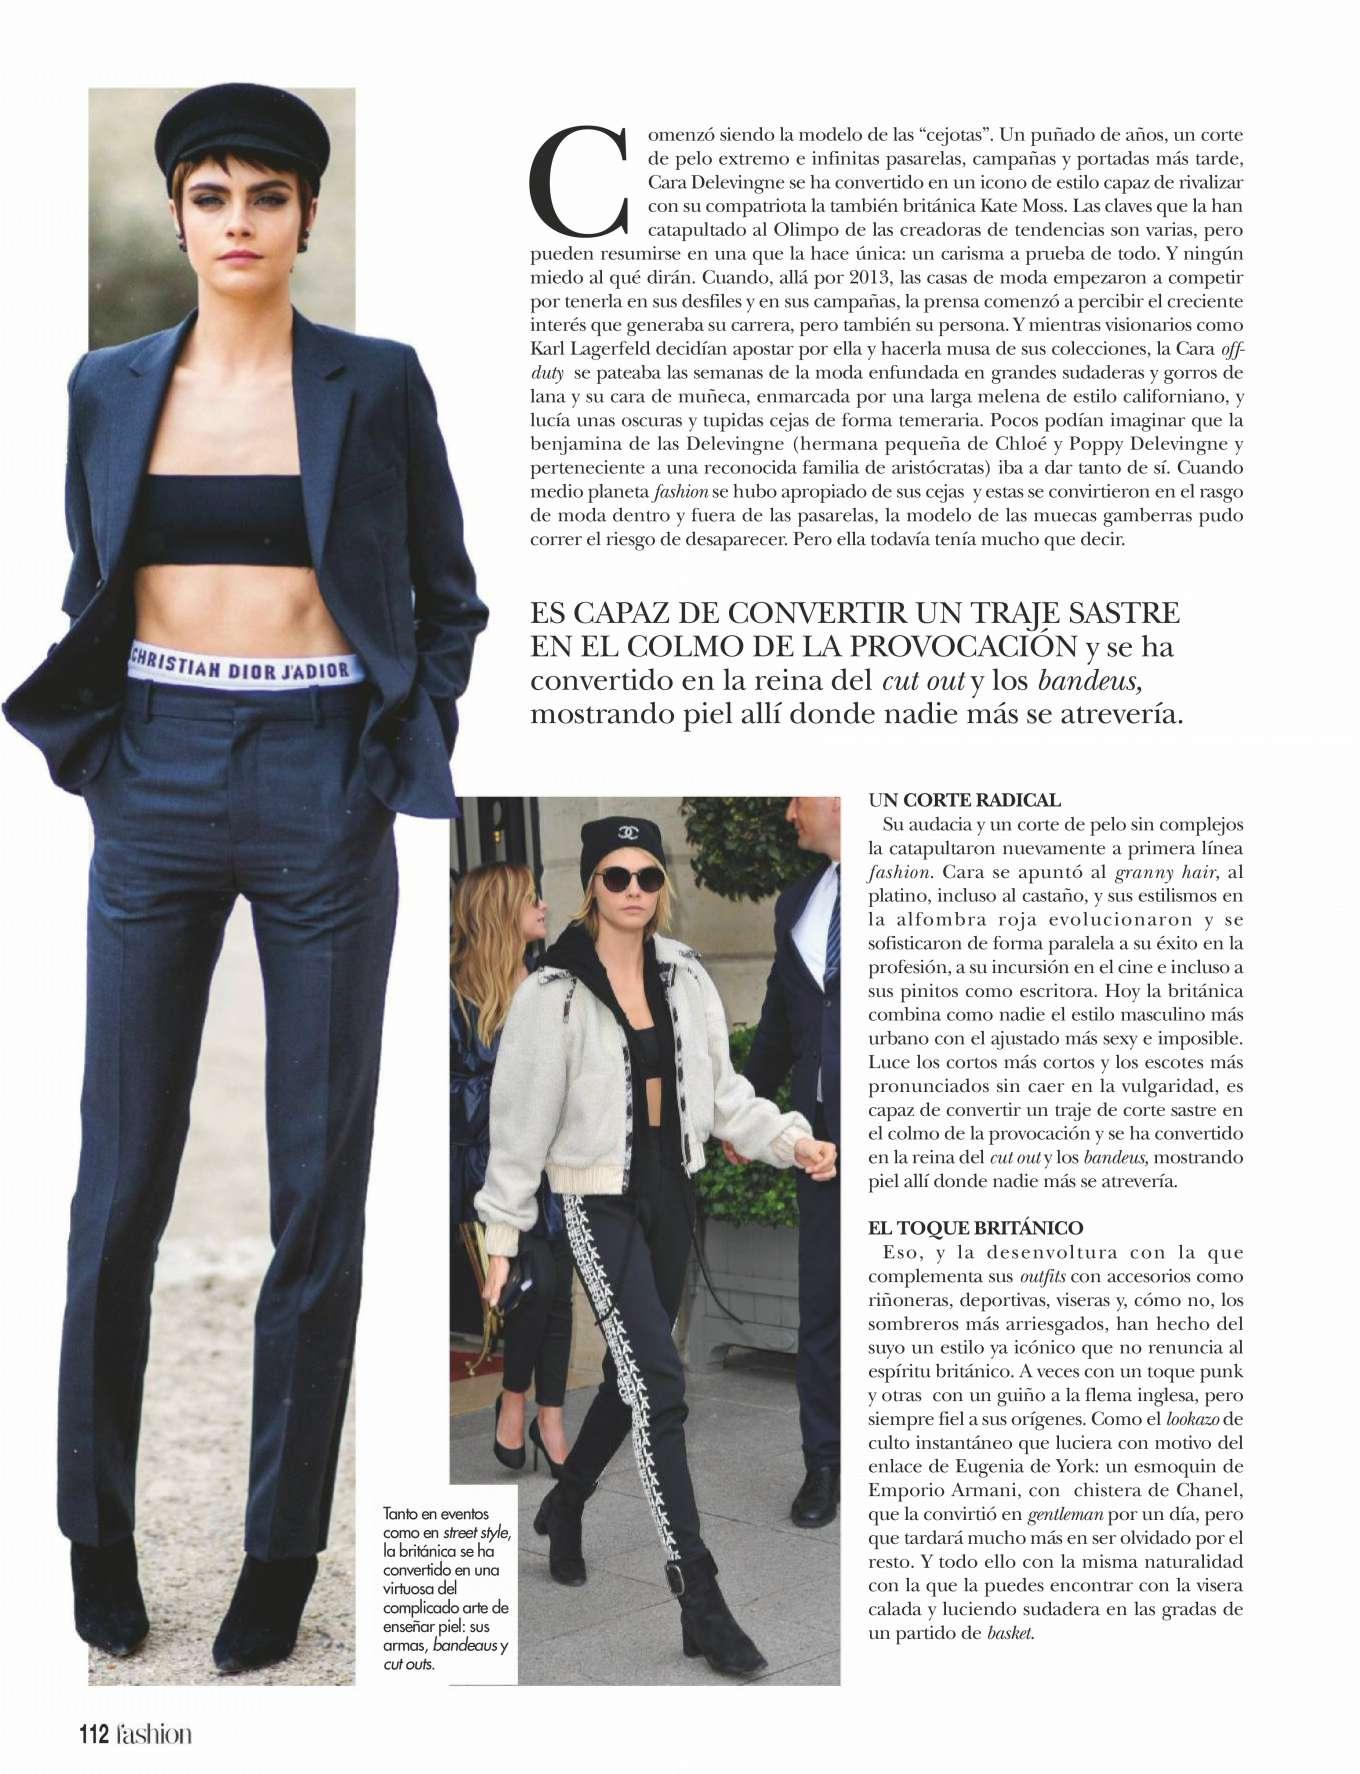 Cara Delevingne 2019 : Cara Delevingne: ¡Hola! Fashion 2019 -01